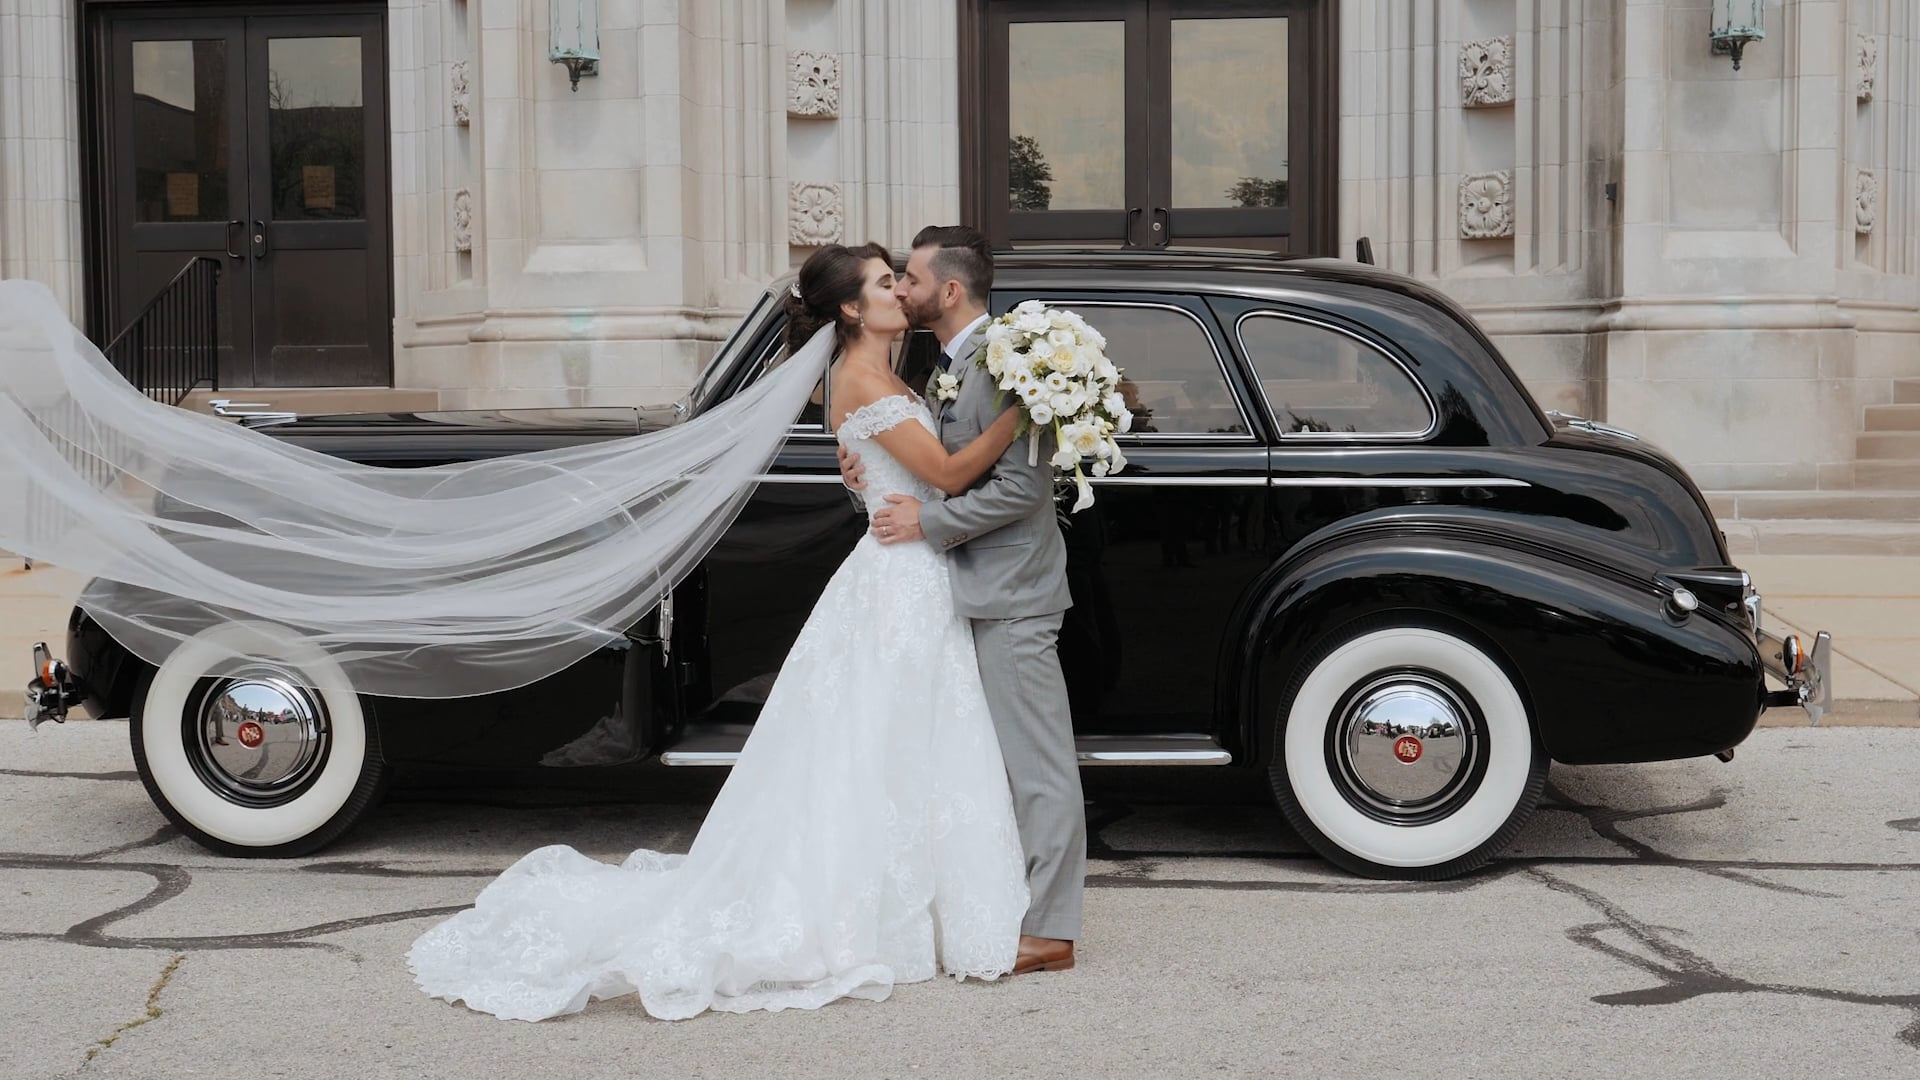 Lisa + Joe   Micro Wedding   6-20-2020